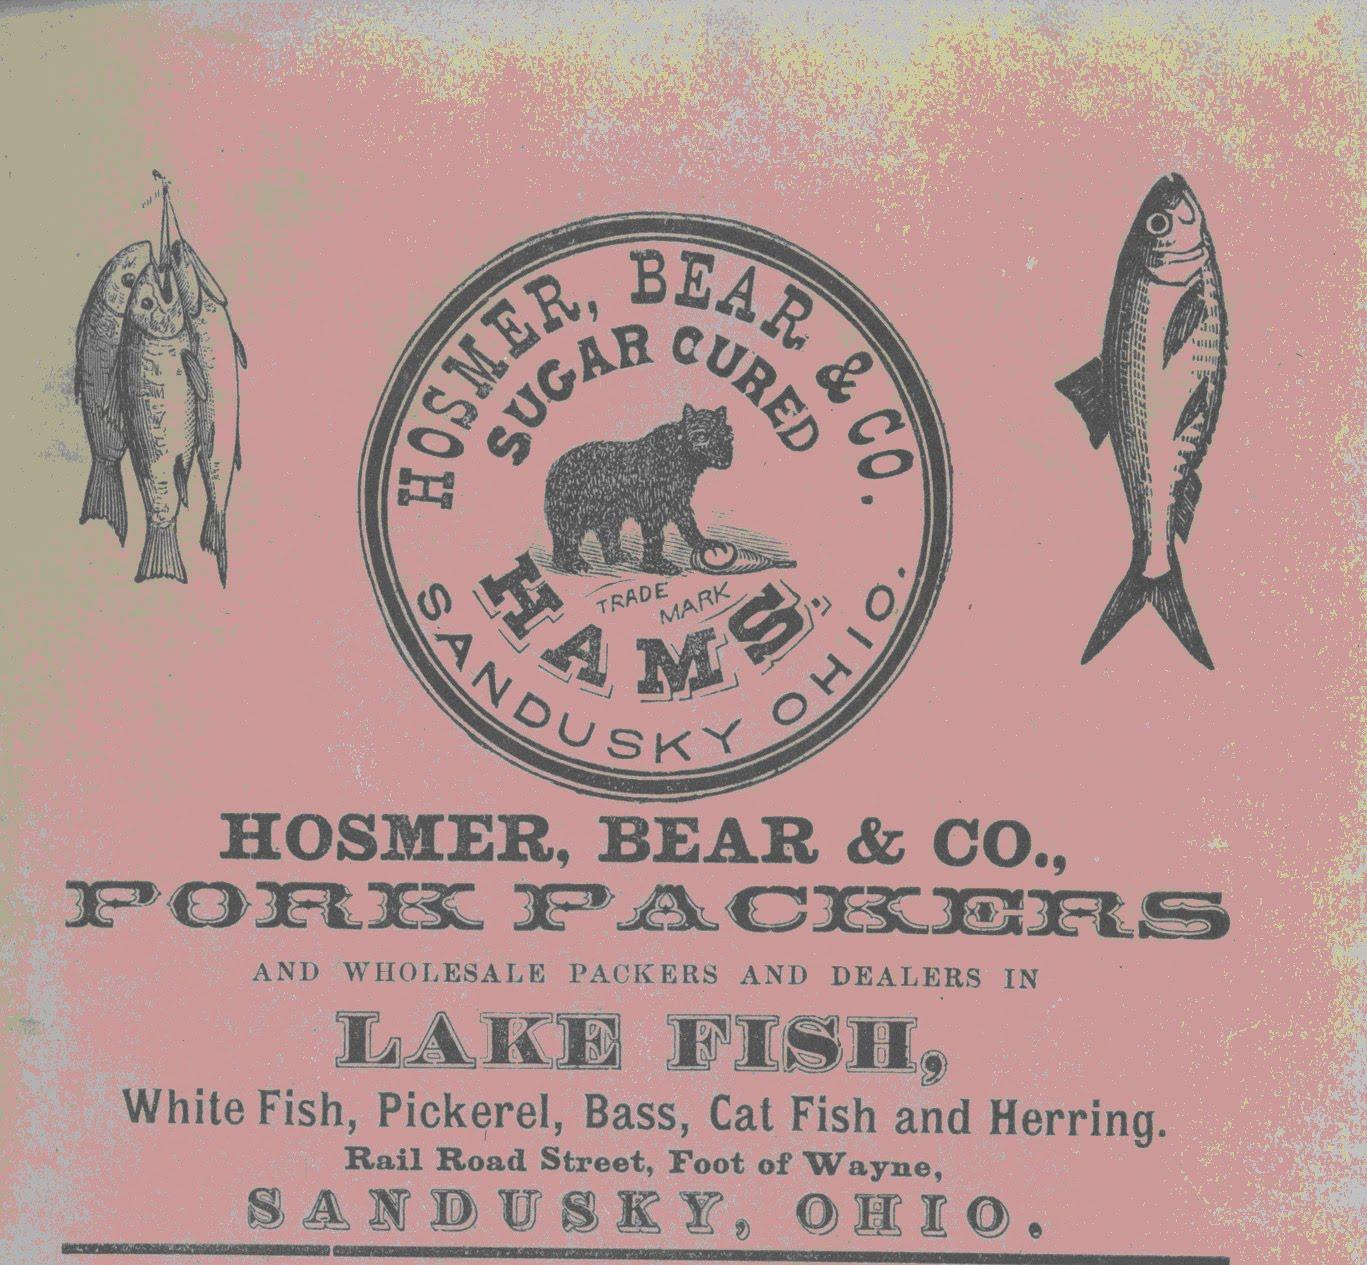 http://3.bp.blogspot.com/_FqSB7xk--1s/S8h0KtDKGtI/AAAAAAAABpo/xl6_IAEQFb0/s1600/Hosmer+Fish.jpg